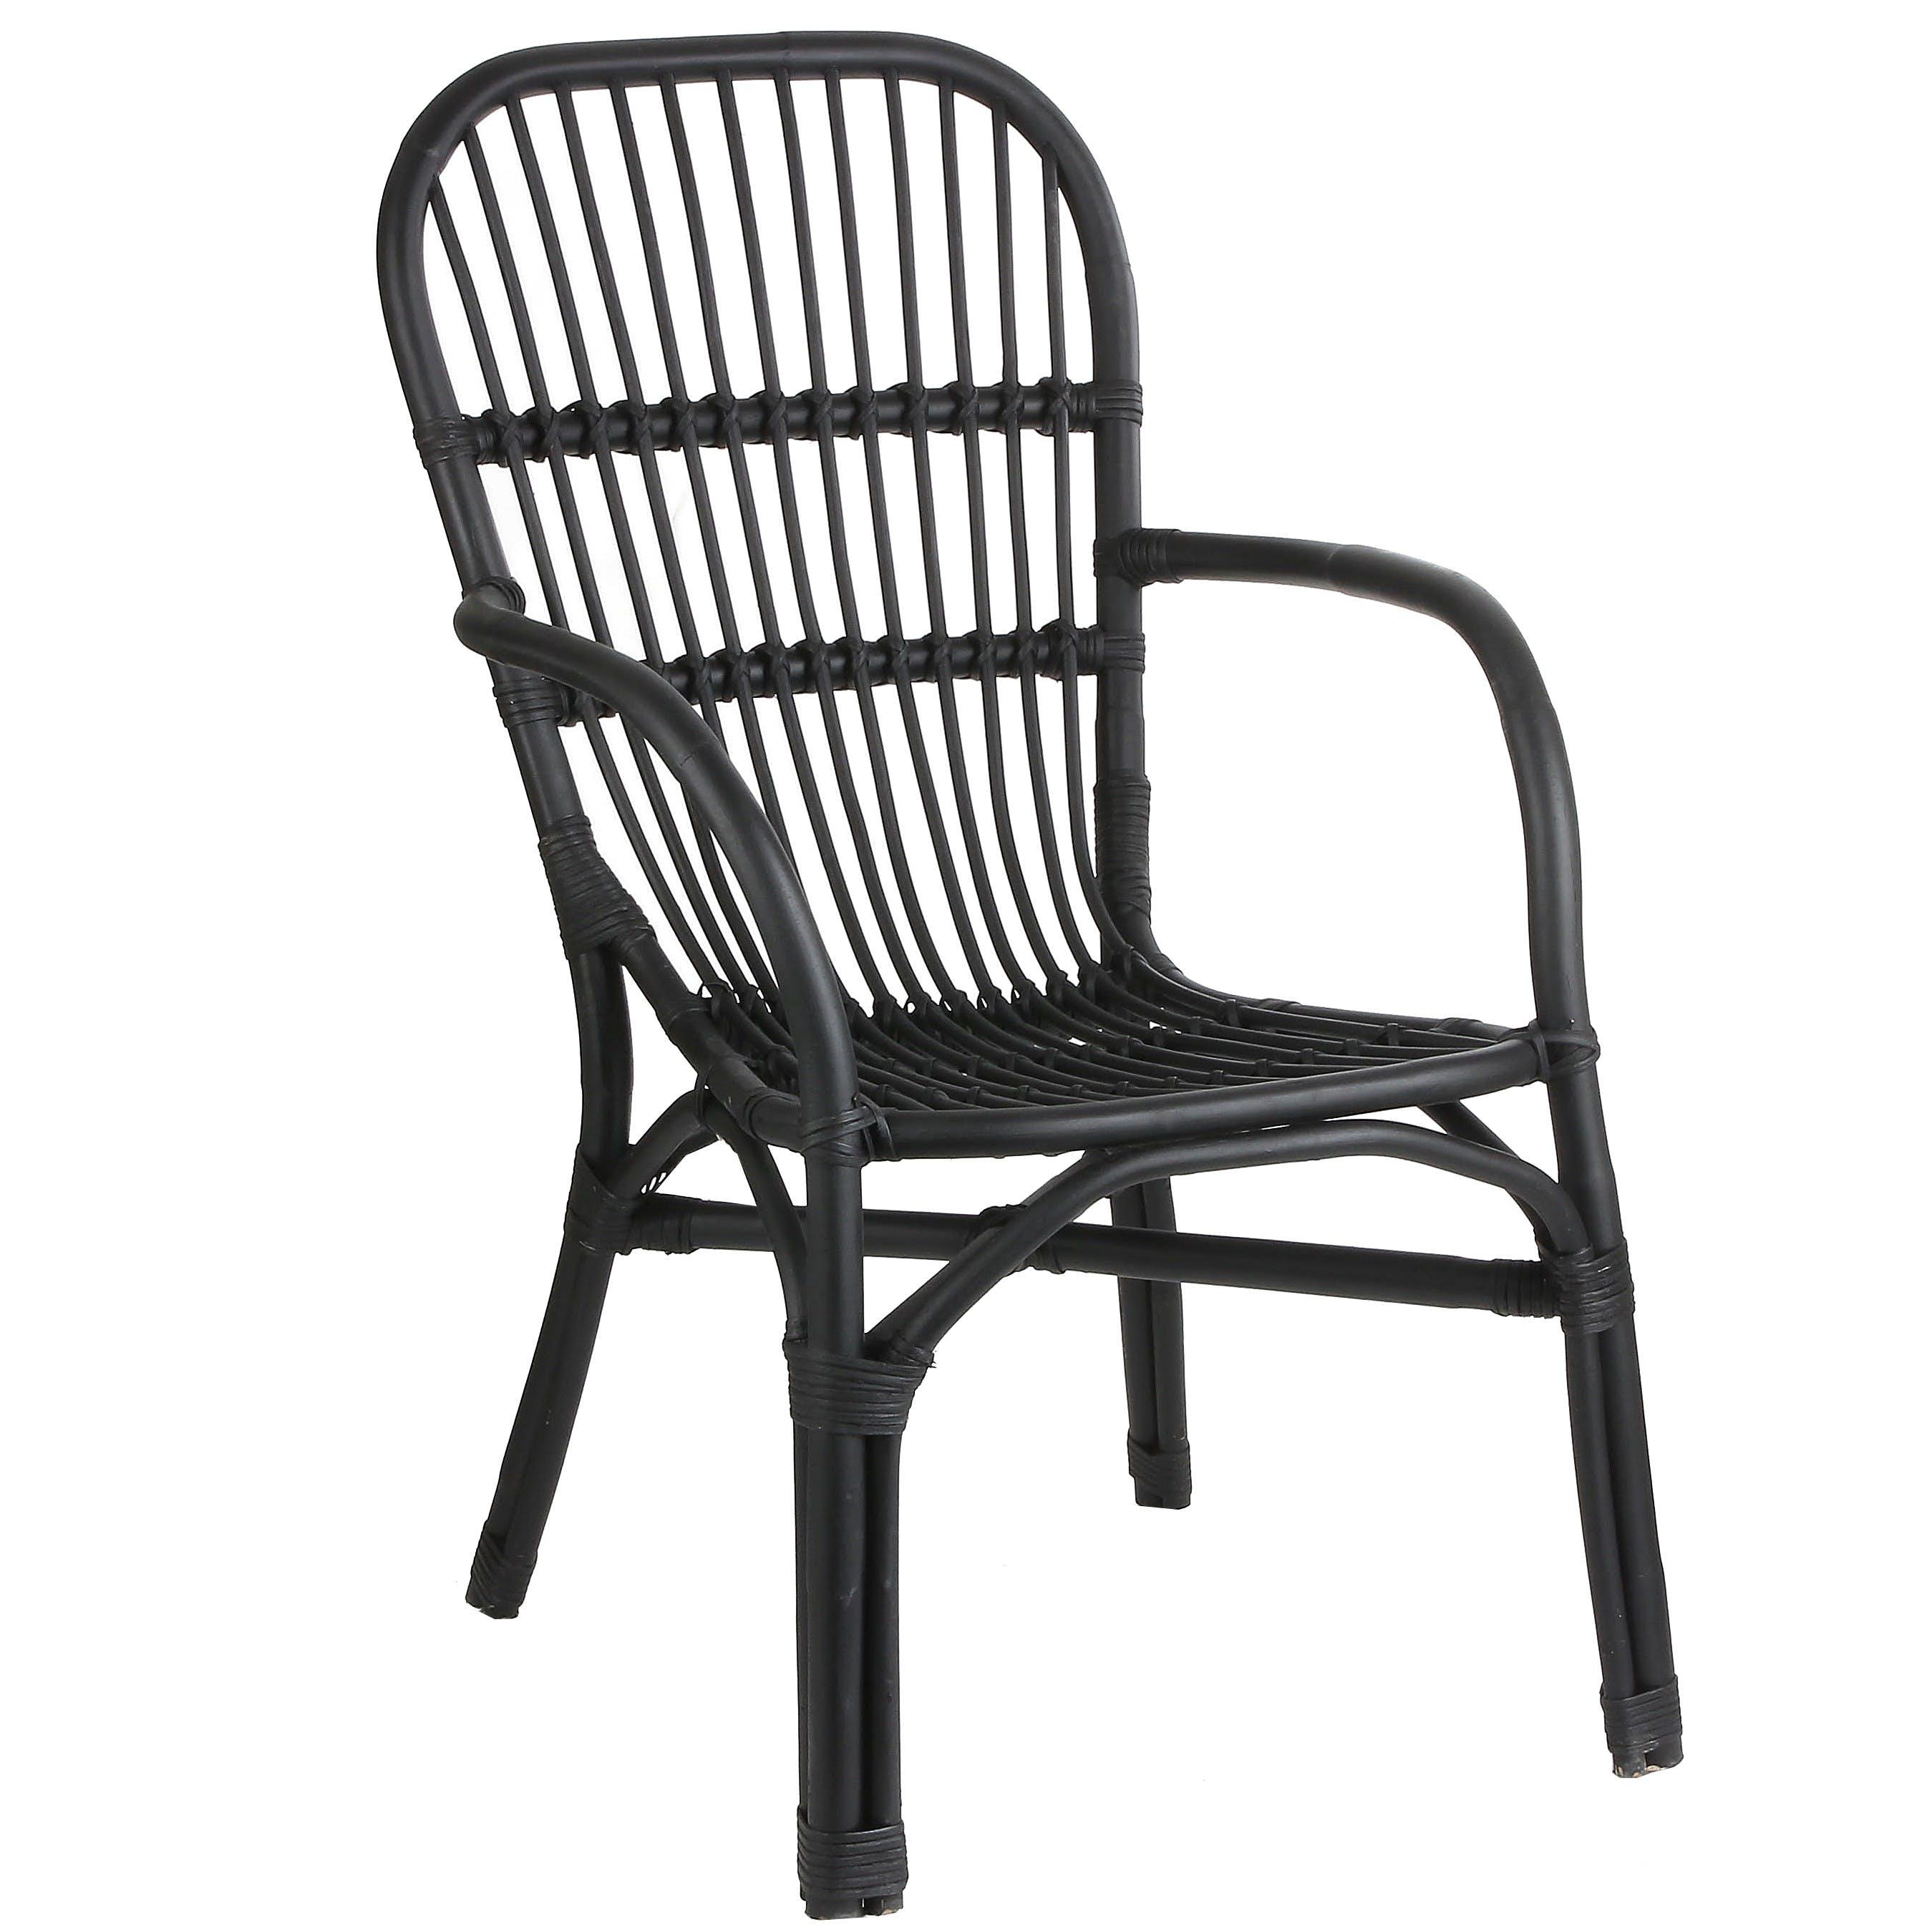 Chaise fauteuil en rotin noir